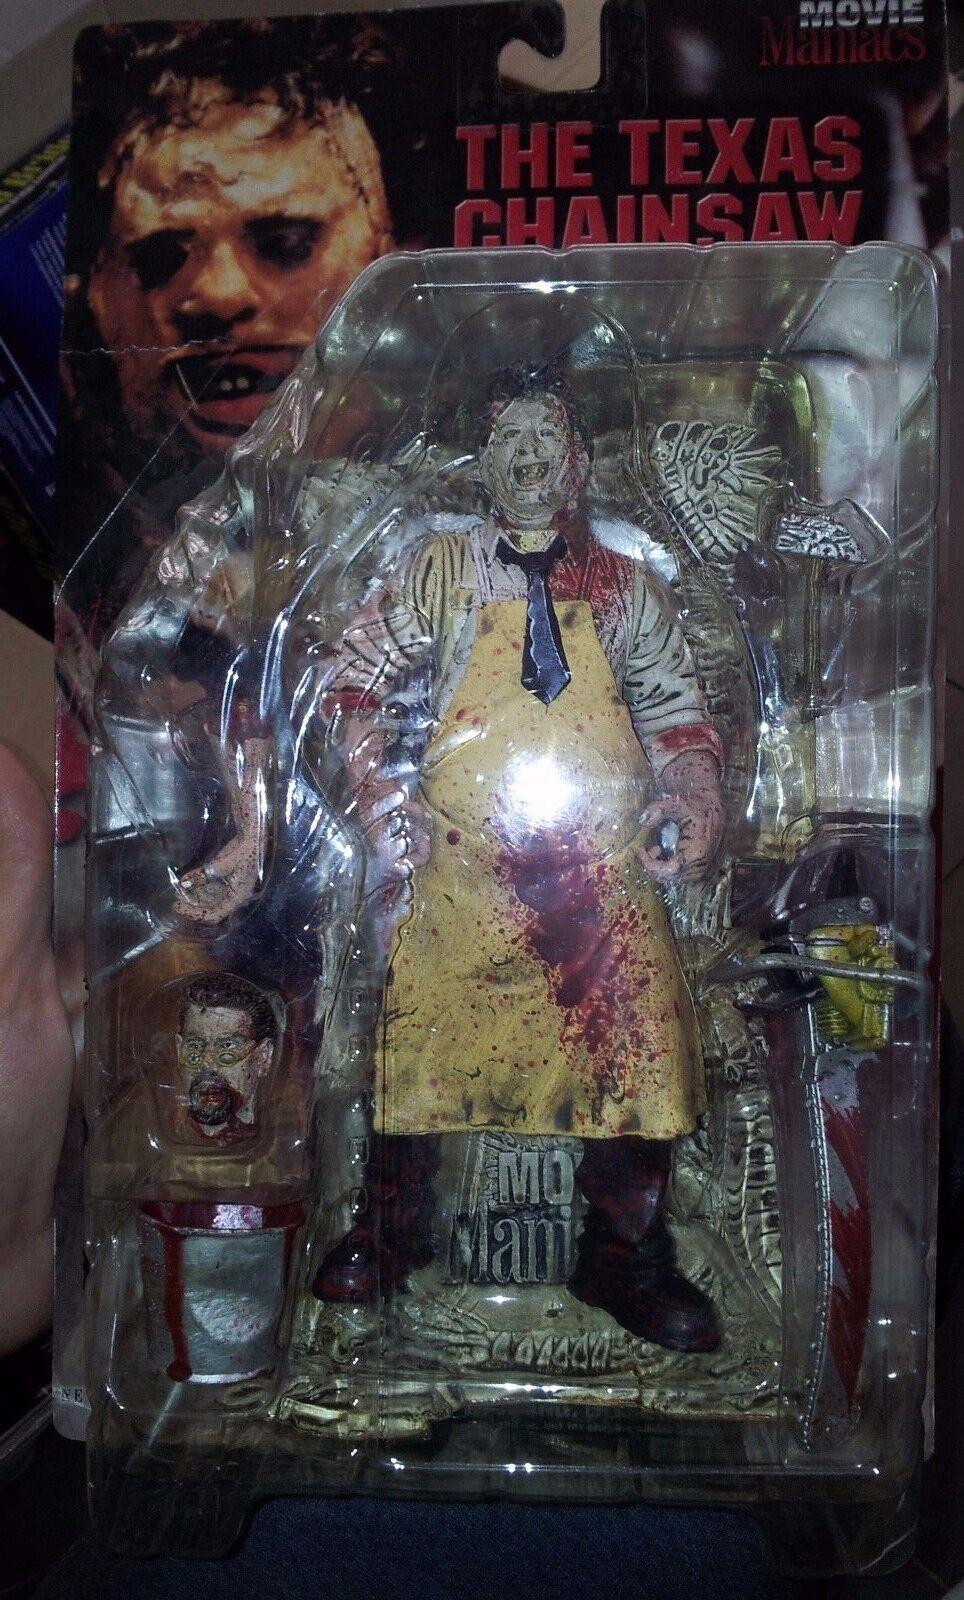 Film - fanatiker - texas chainsaw massacre leatherface figur, Blautigen variante, mip